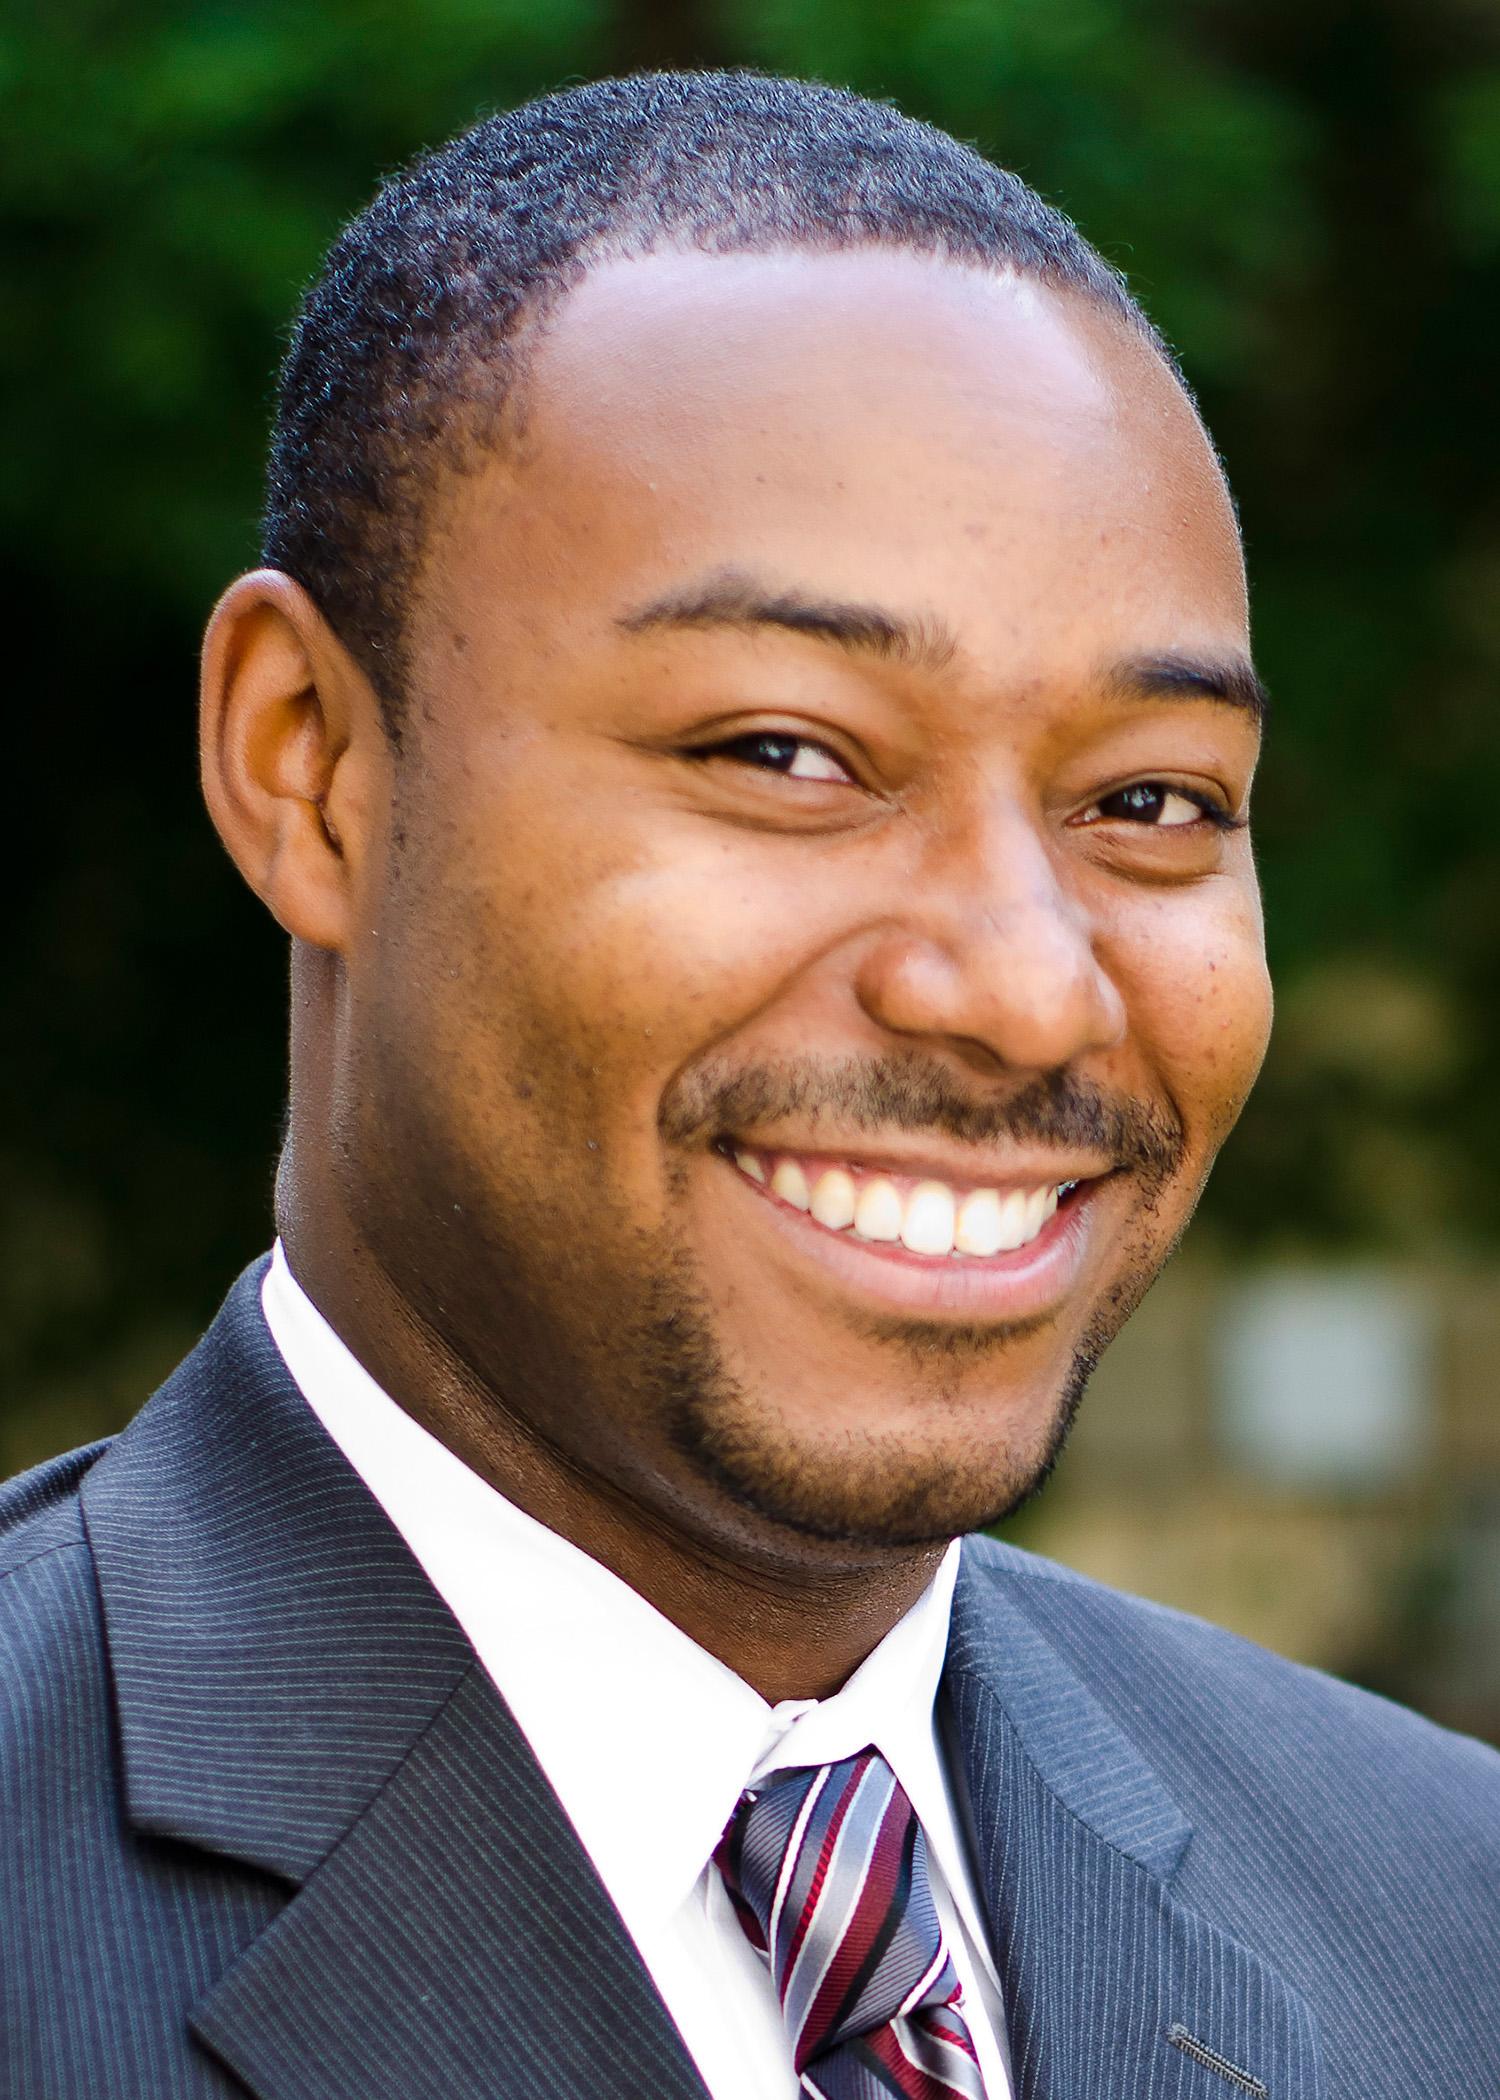 Justin Hansford, Professor, St. Louis University School of Law